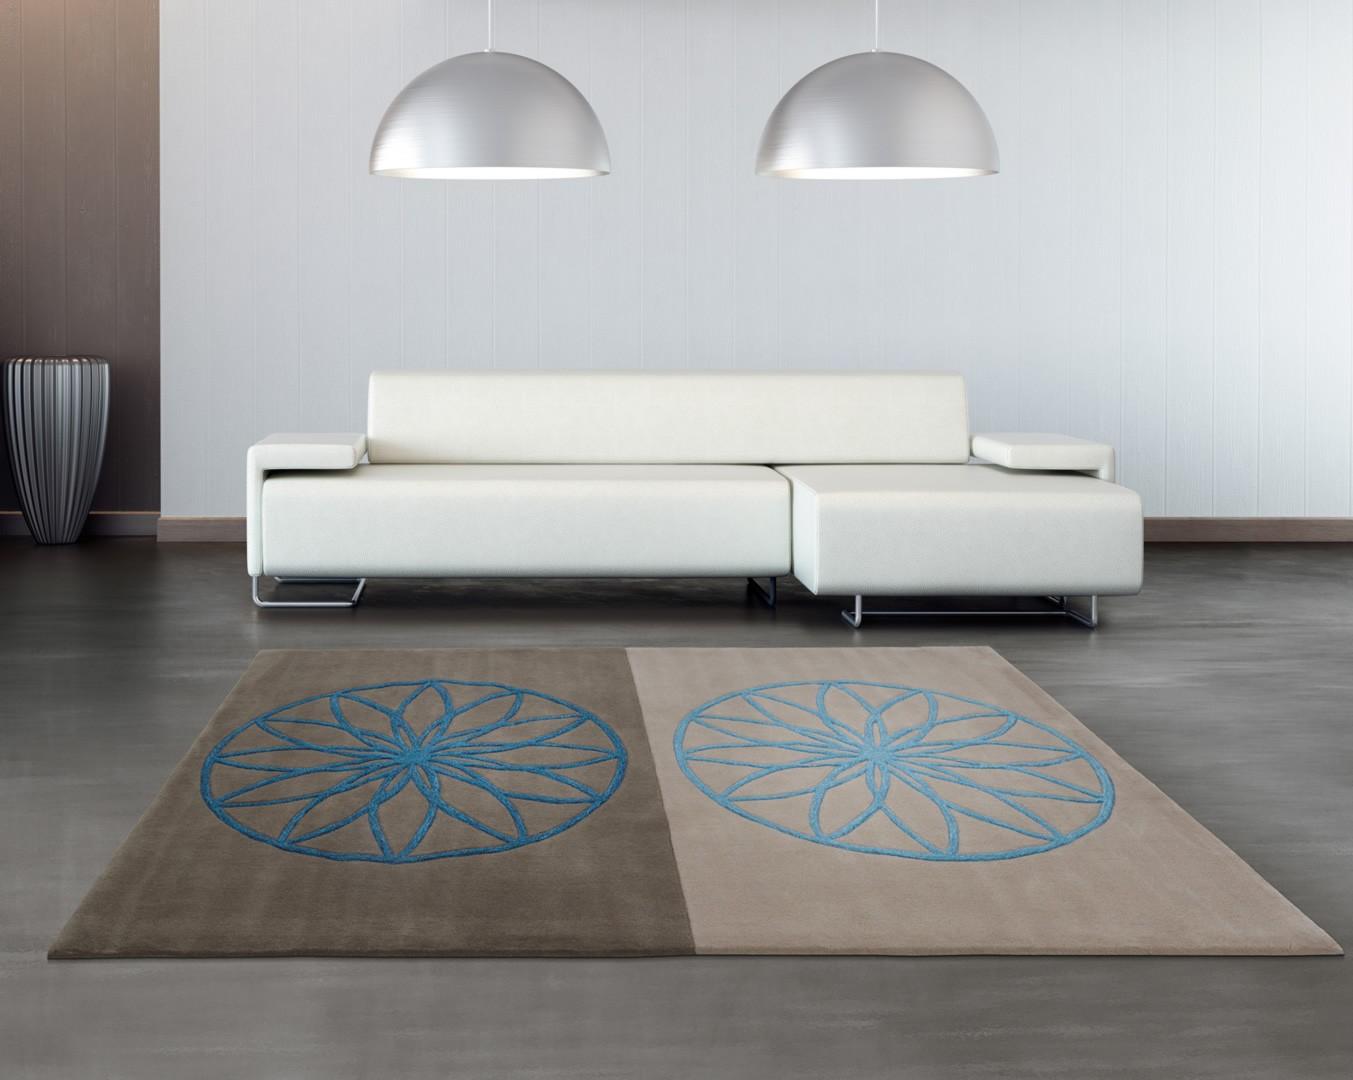 tapis bleu et gris revival arte espina. Black Bedroom Furniture Sets. Home Design Ideas